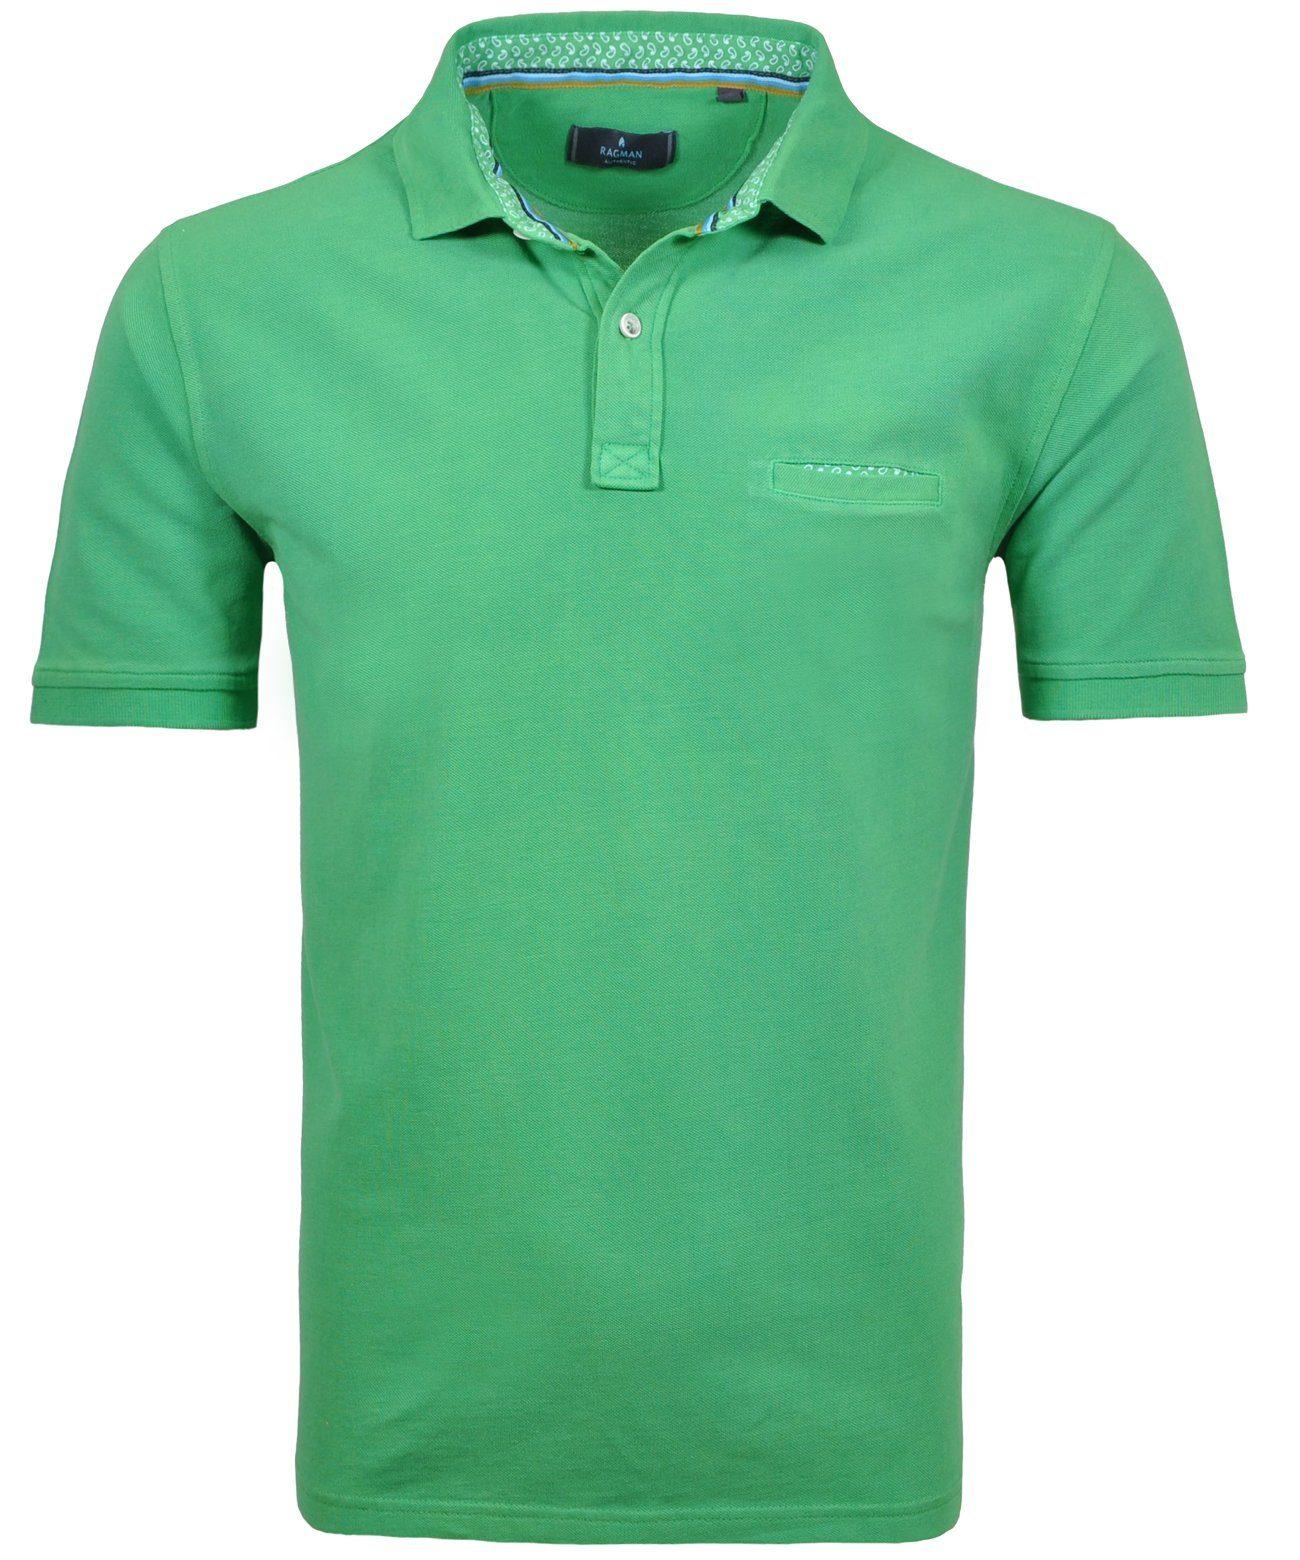 RAGMAN Poloshirt | Bekleidung > Polo Shirts > Kurzarm | Ragman